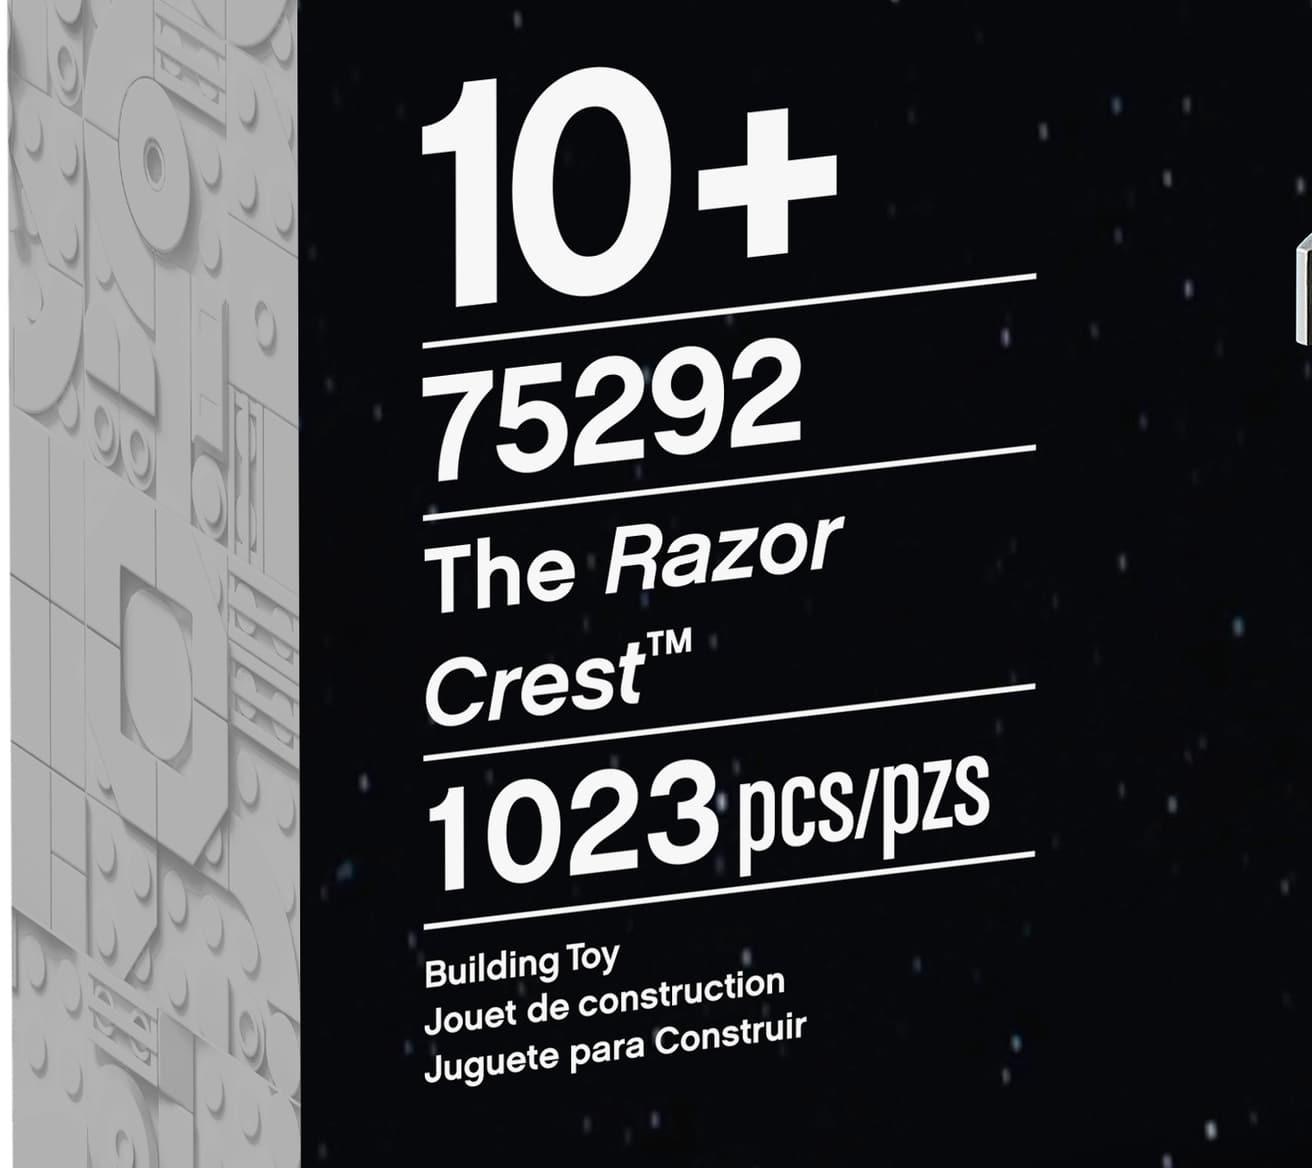 The Razor Crest